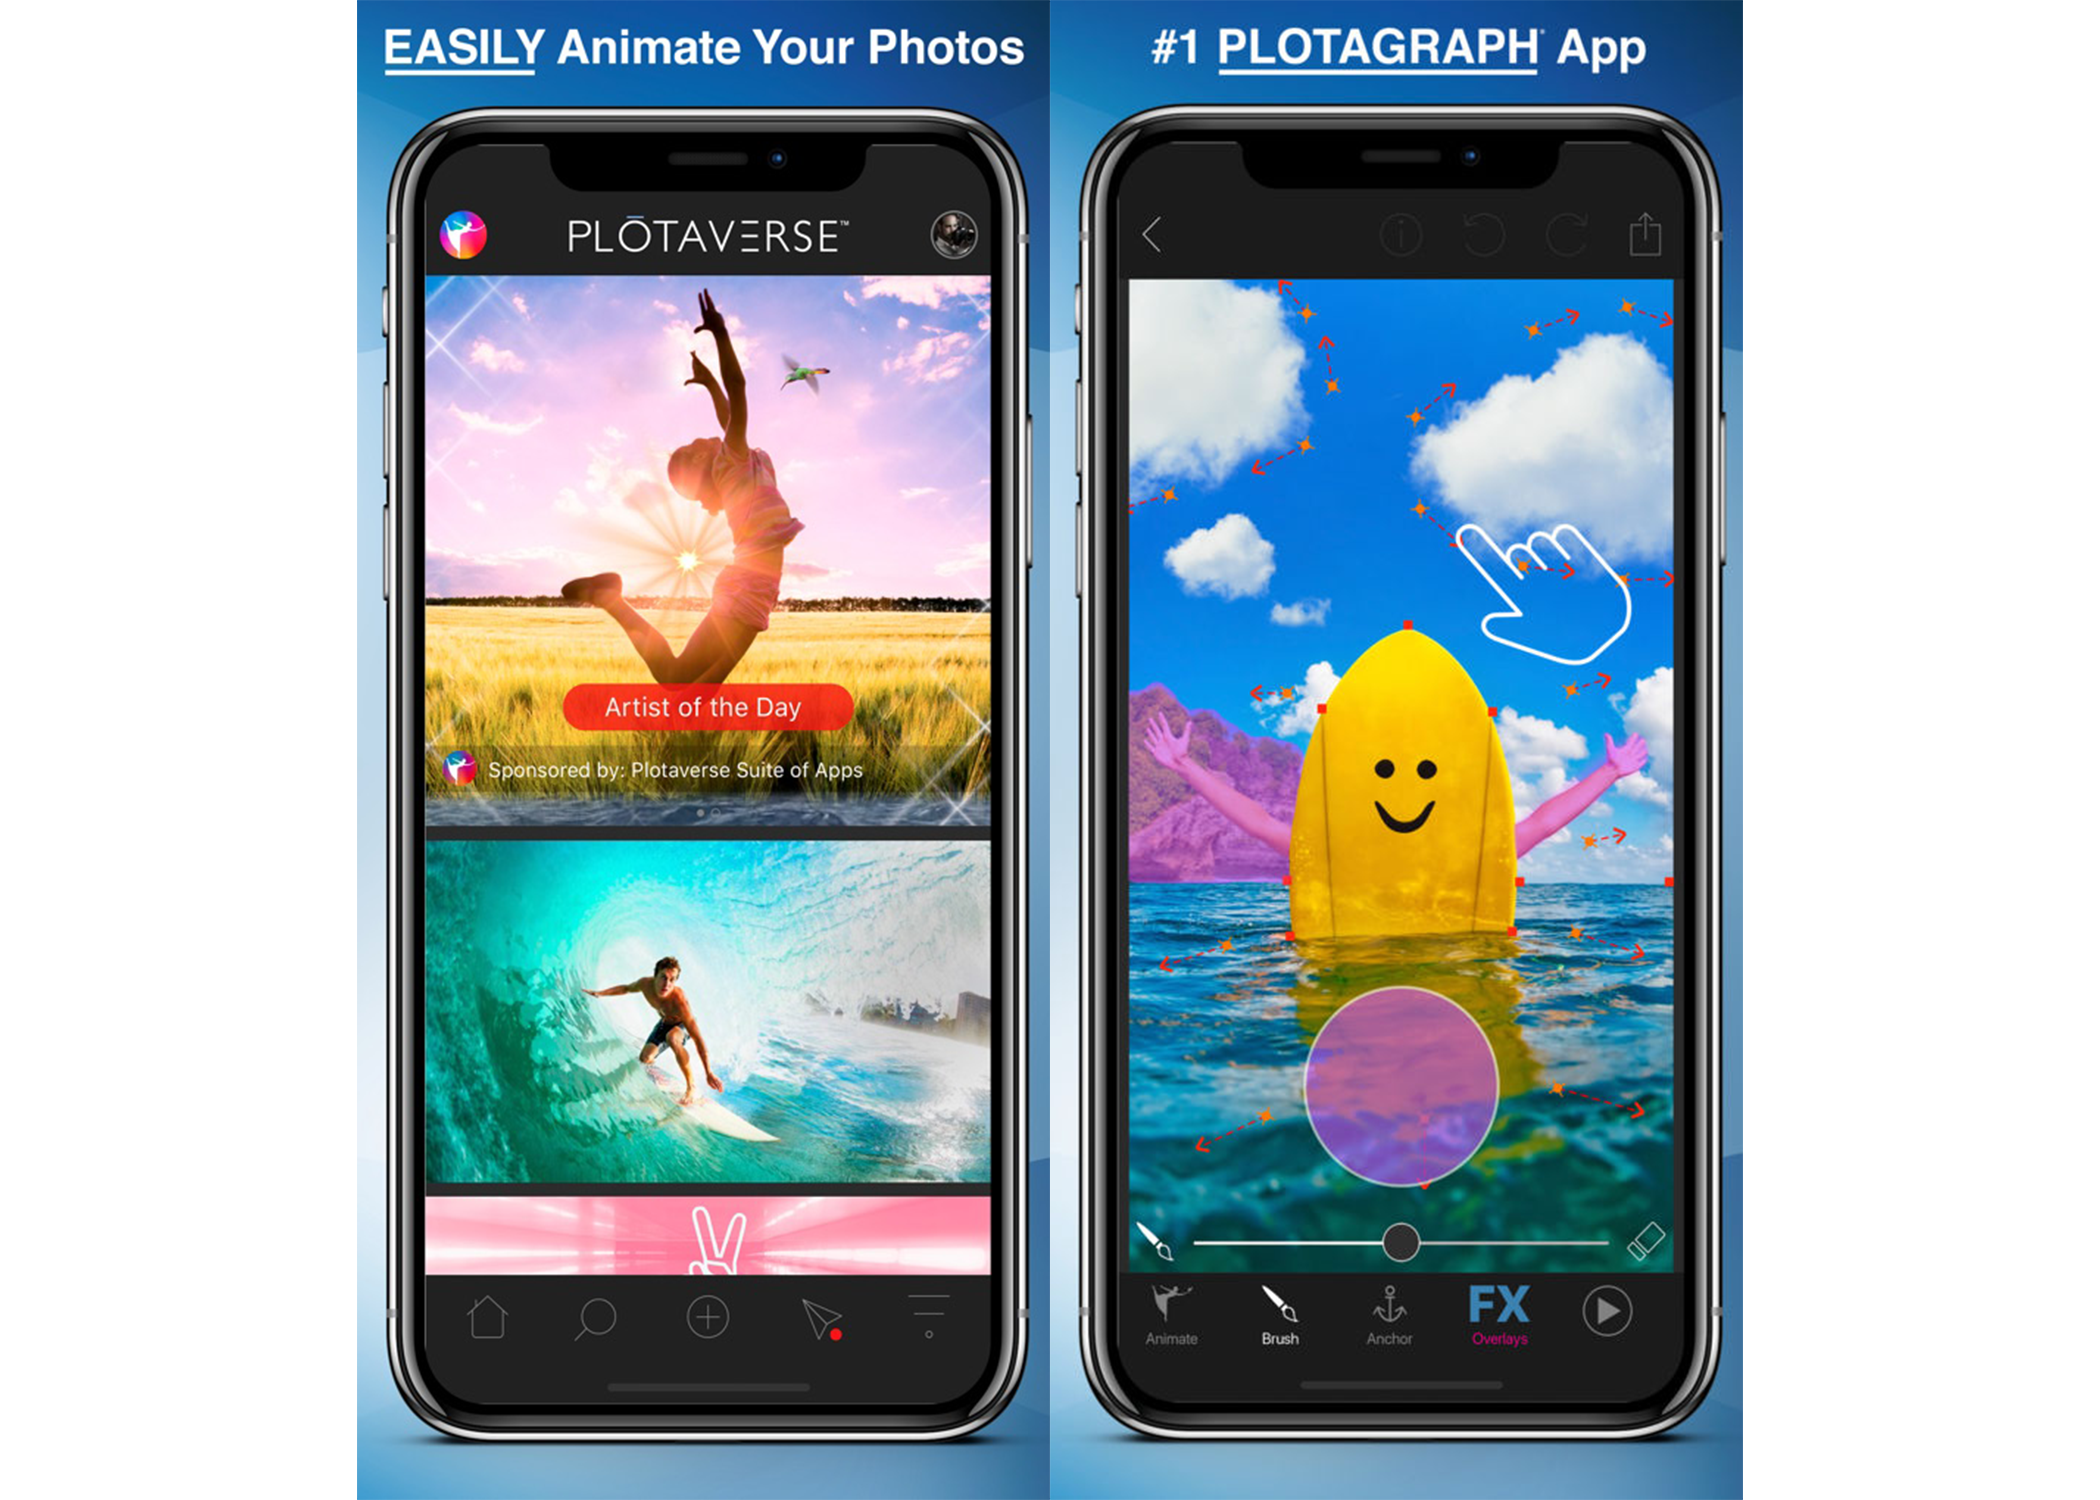 Plotograph app